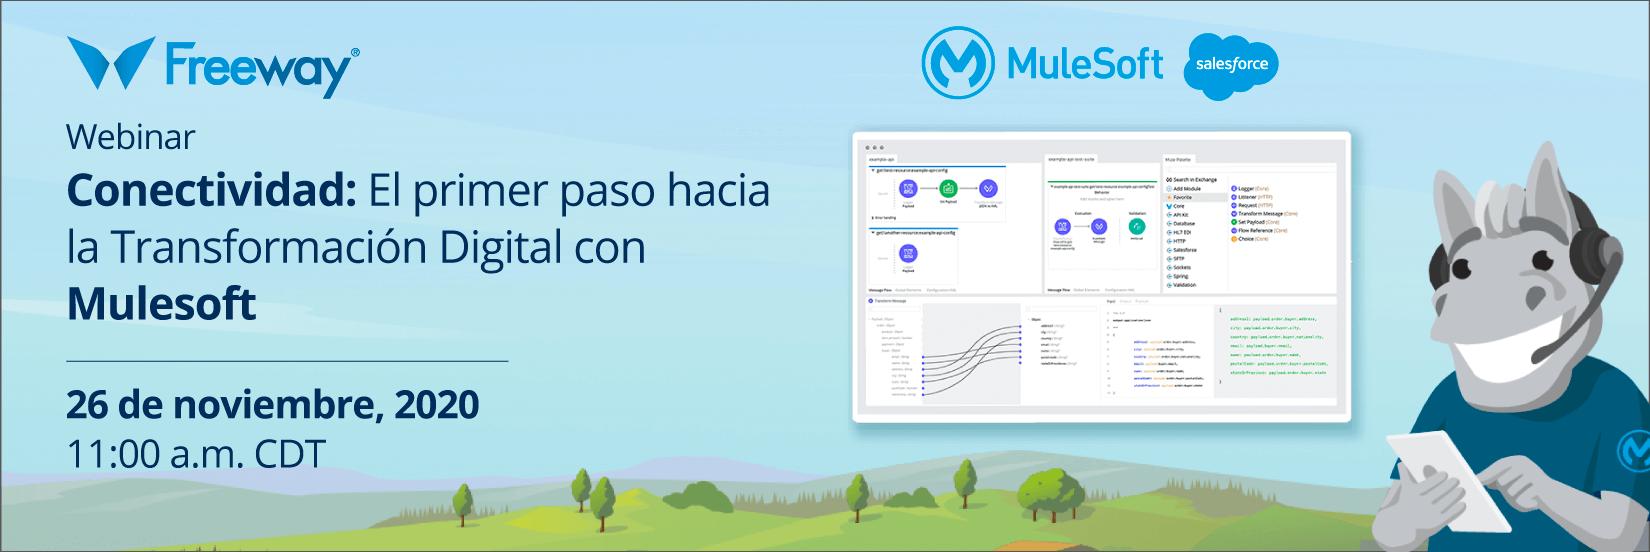 Webinar Mulesoft